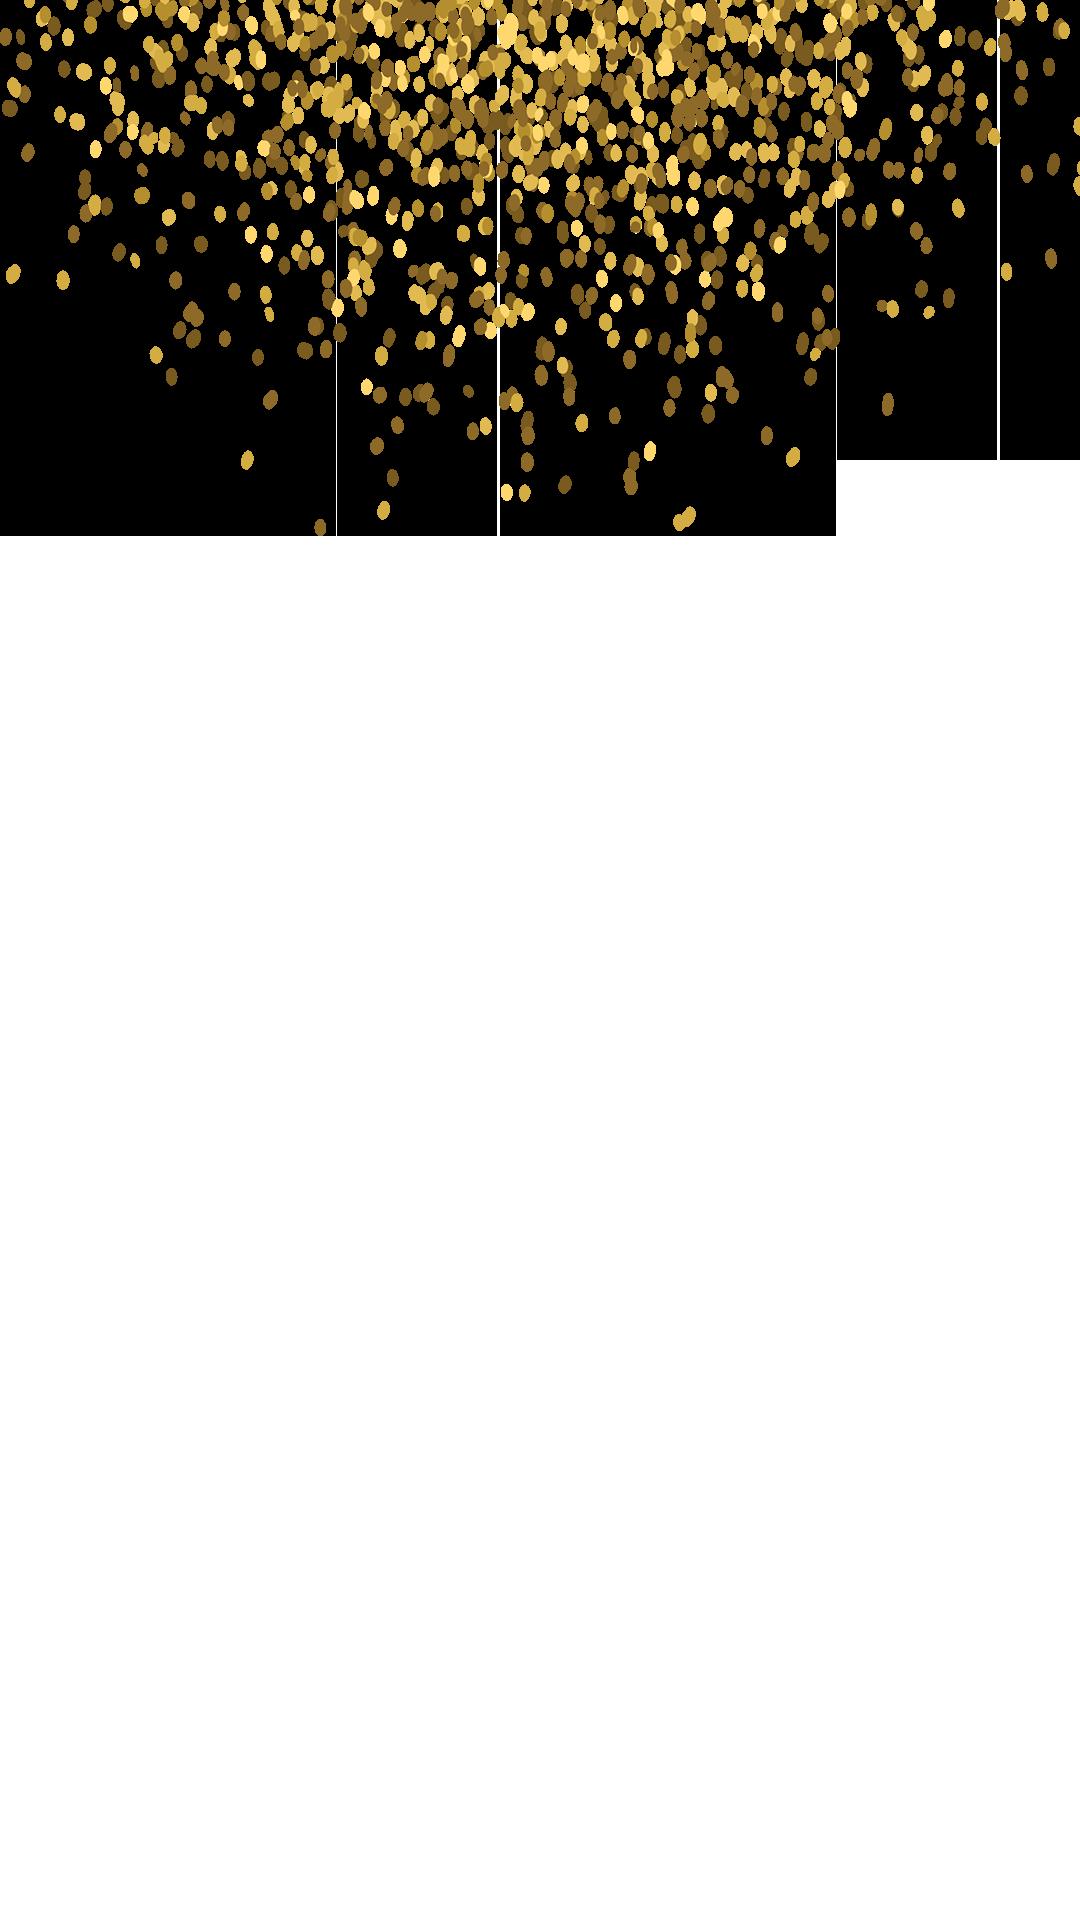 Glitter clipart gold glitter line. Engagement snapchat filter geofilter